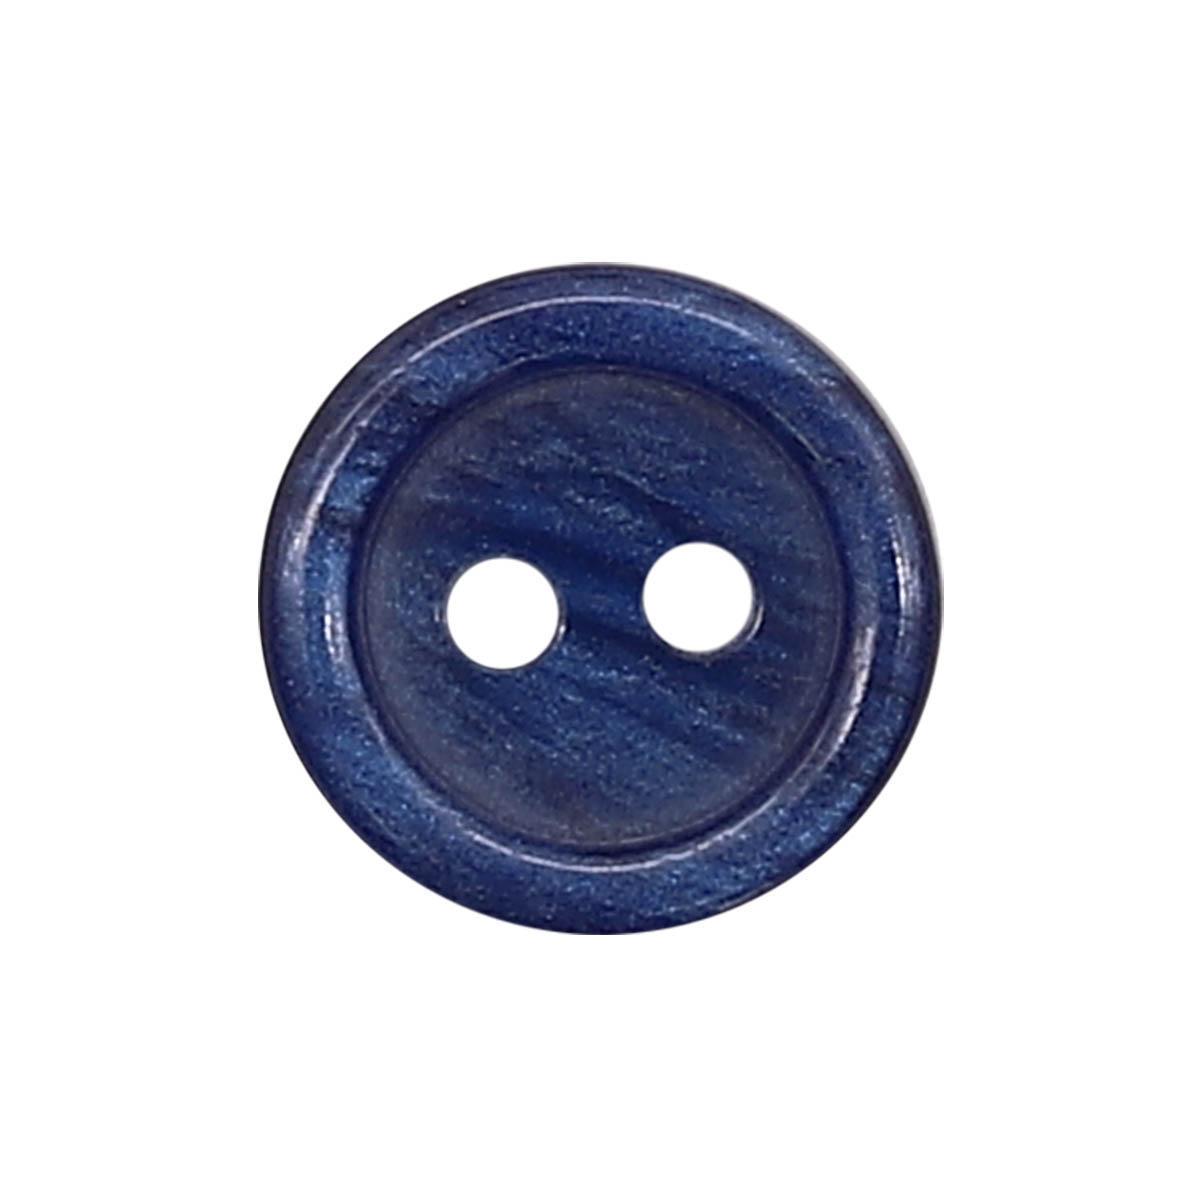 35483/2 18 (3507) Пуговица 2прокола син.глянц.полиэстер ГР